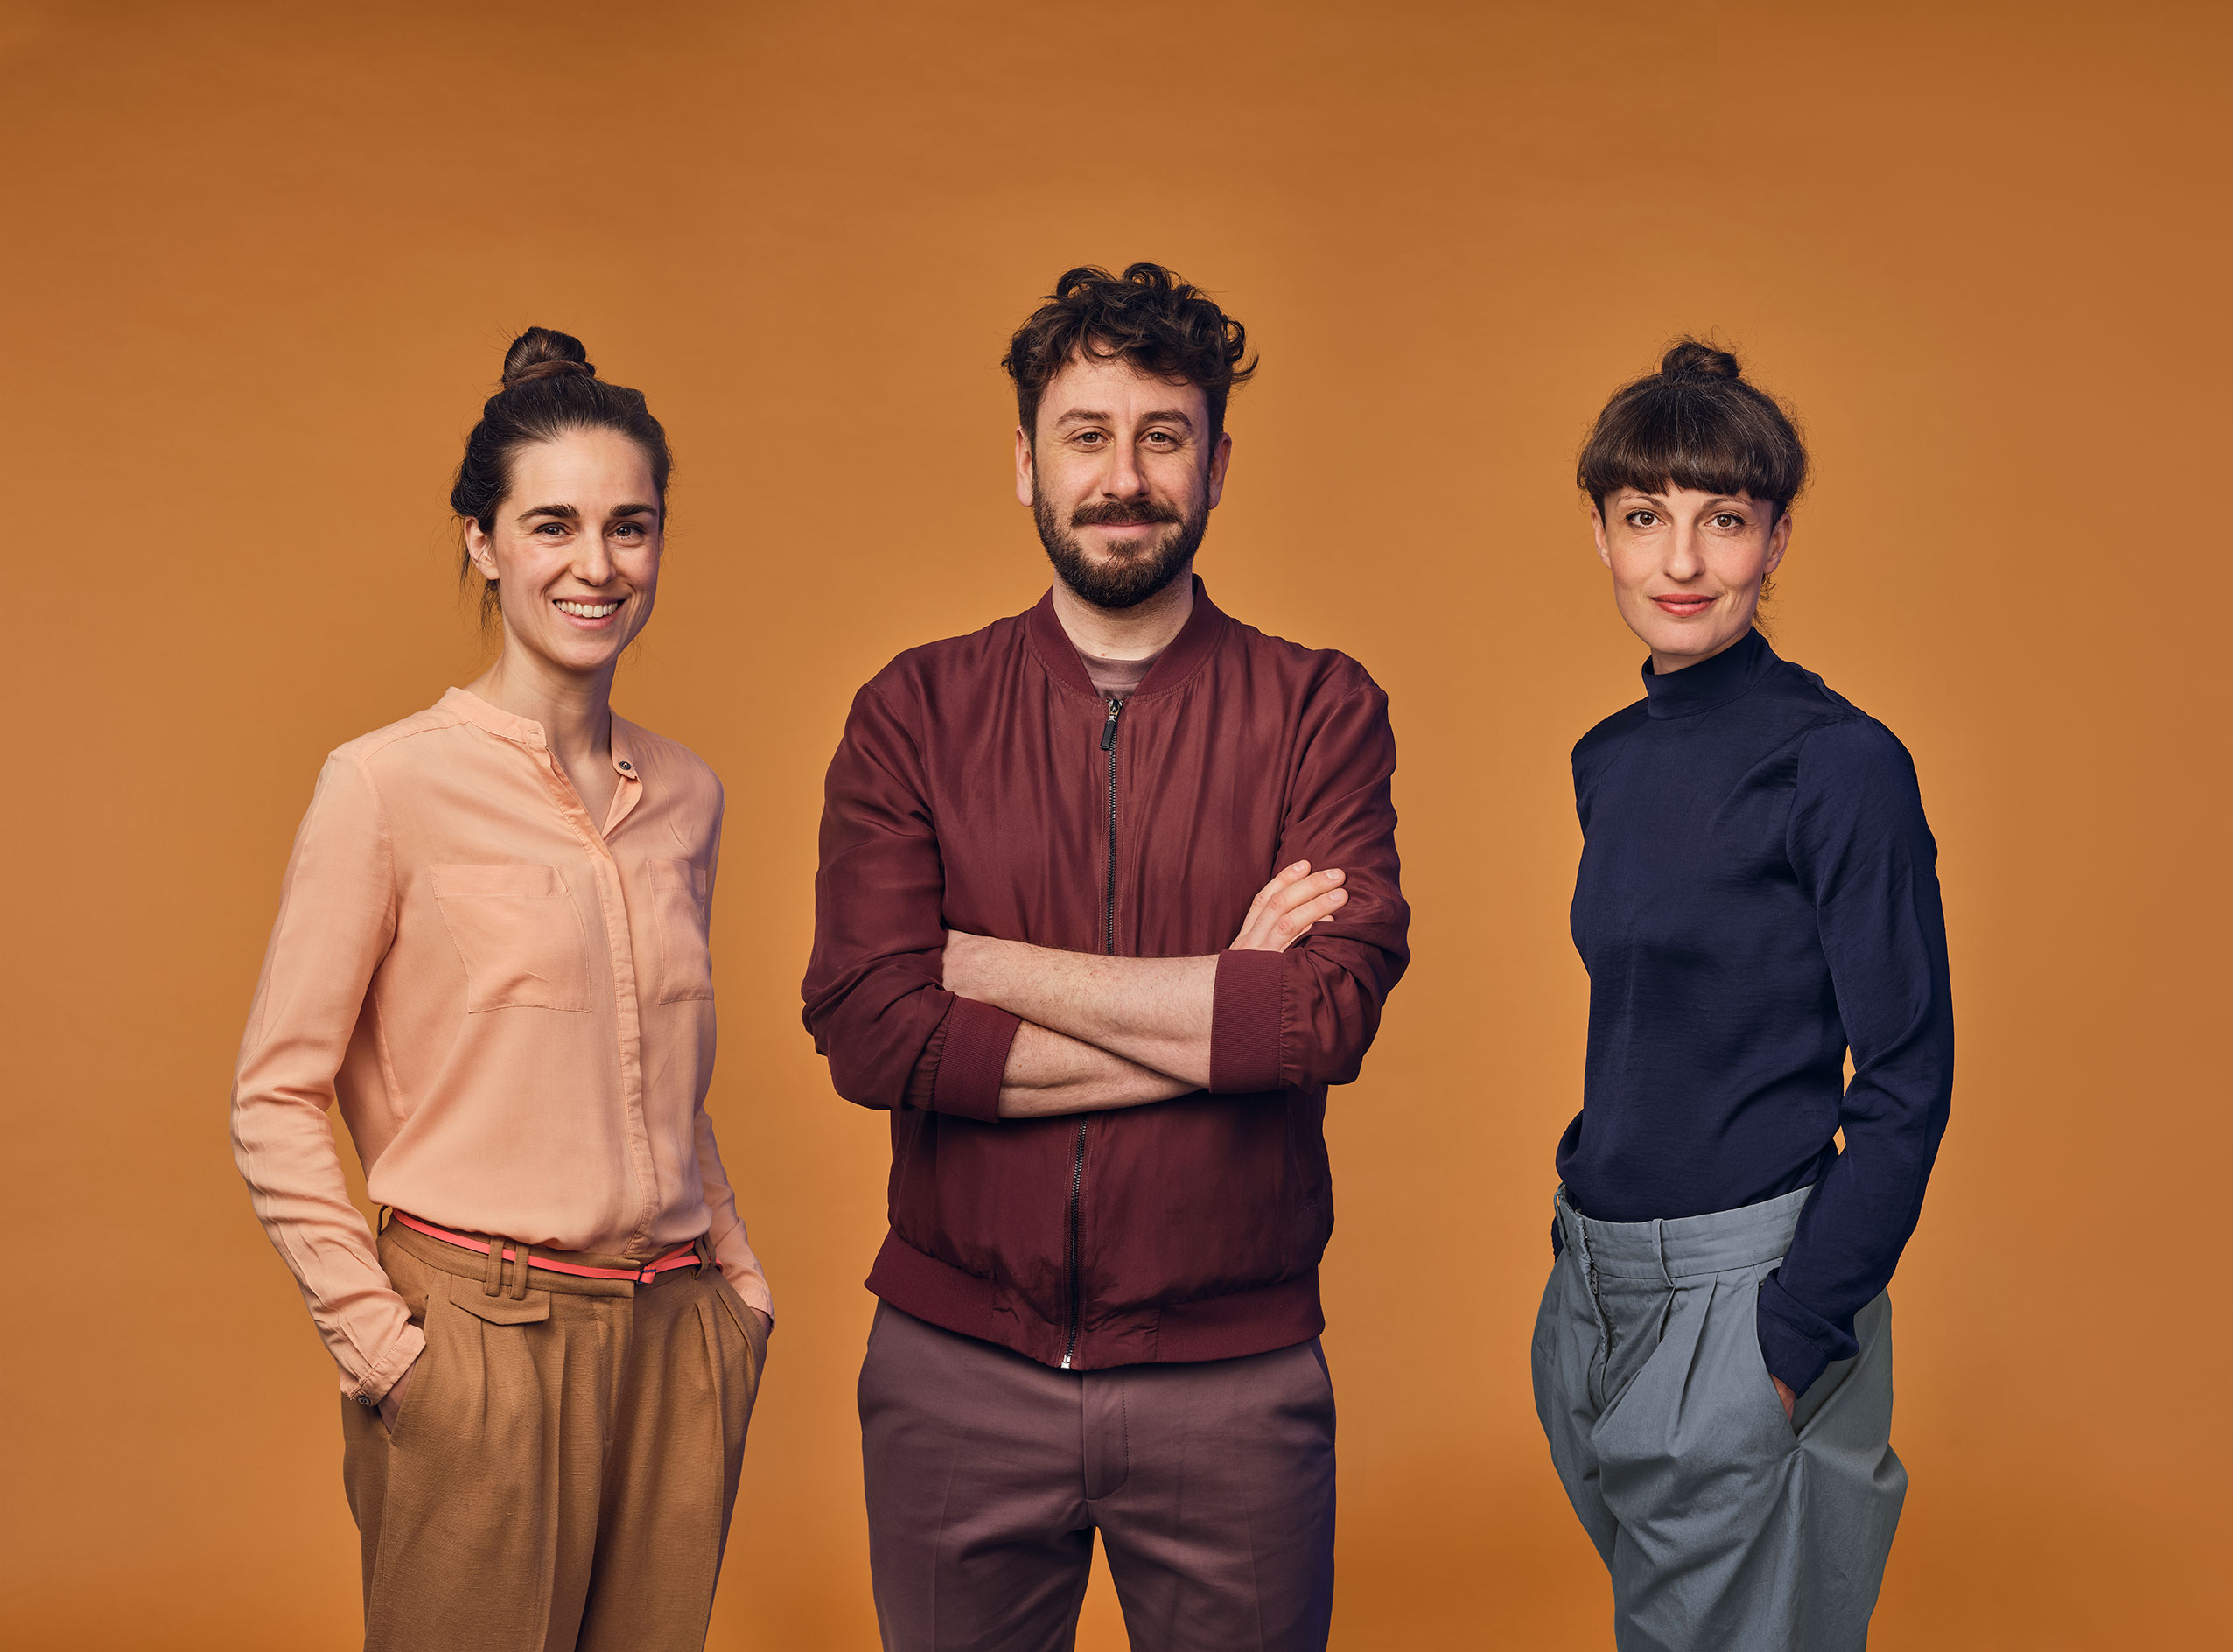 Jule Schäfer, Nils Krämer, Franziska Strantz, We & Me Design Studio, Stuttgart